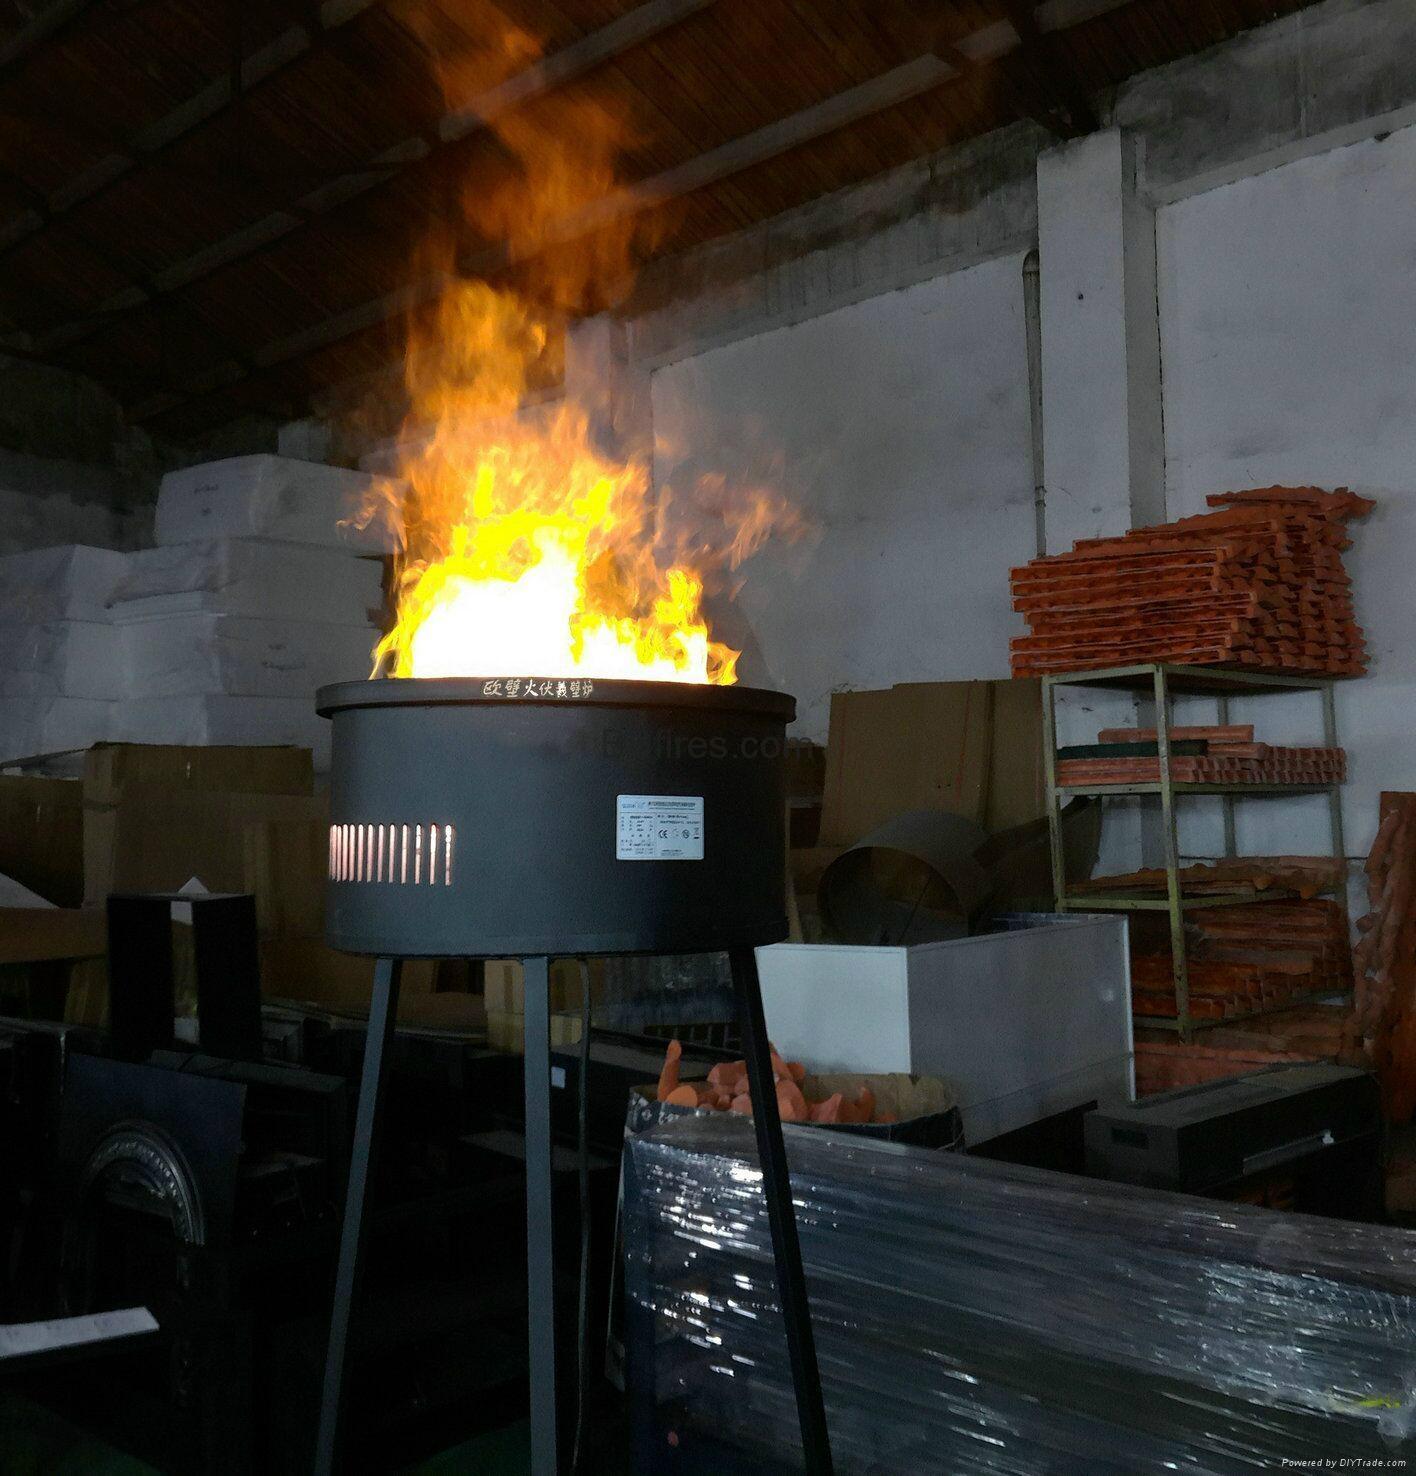 Real Fire Amp 3d Torch Burning Fireplace Al3011 Bb Hong